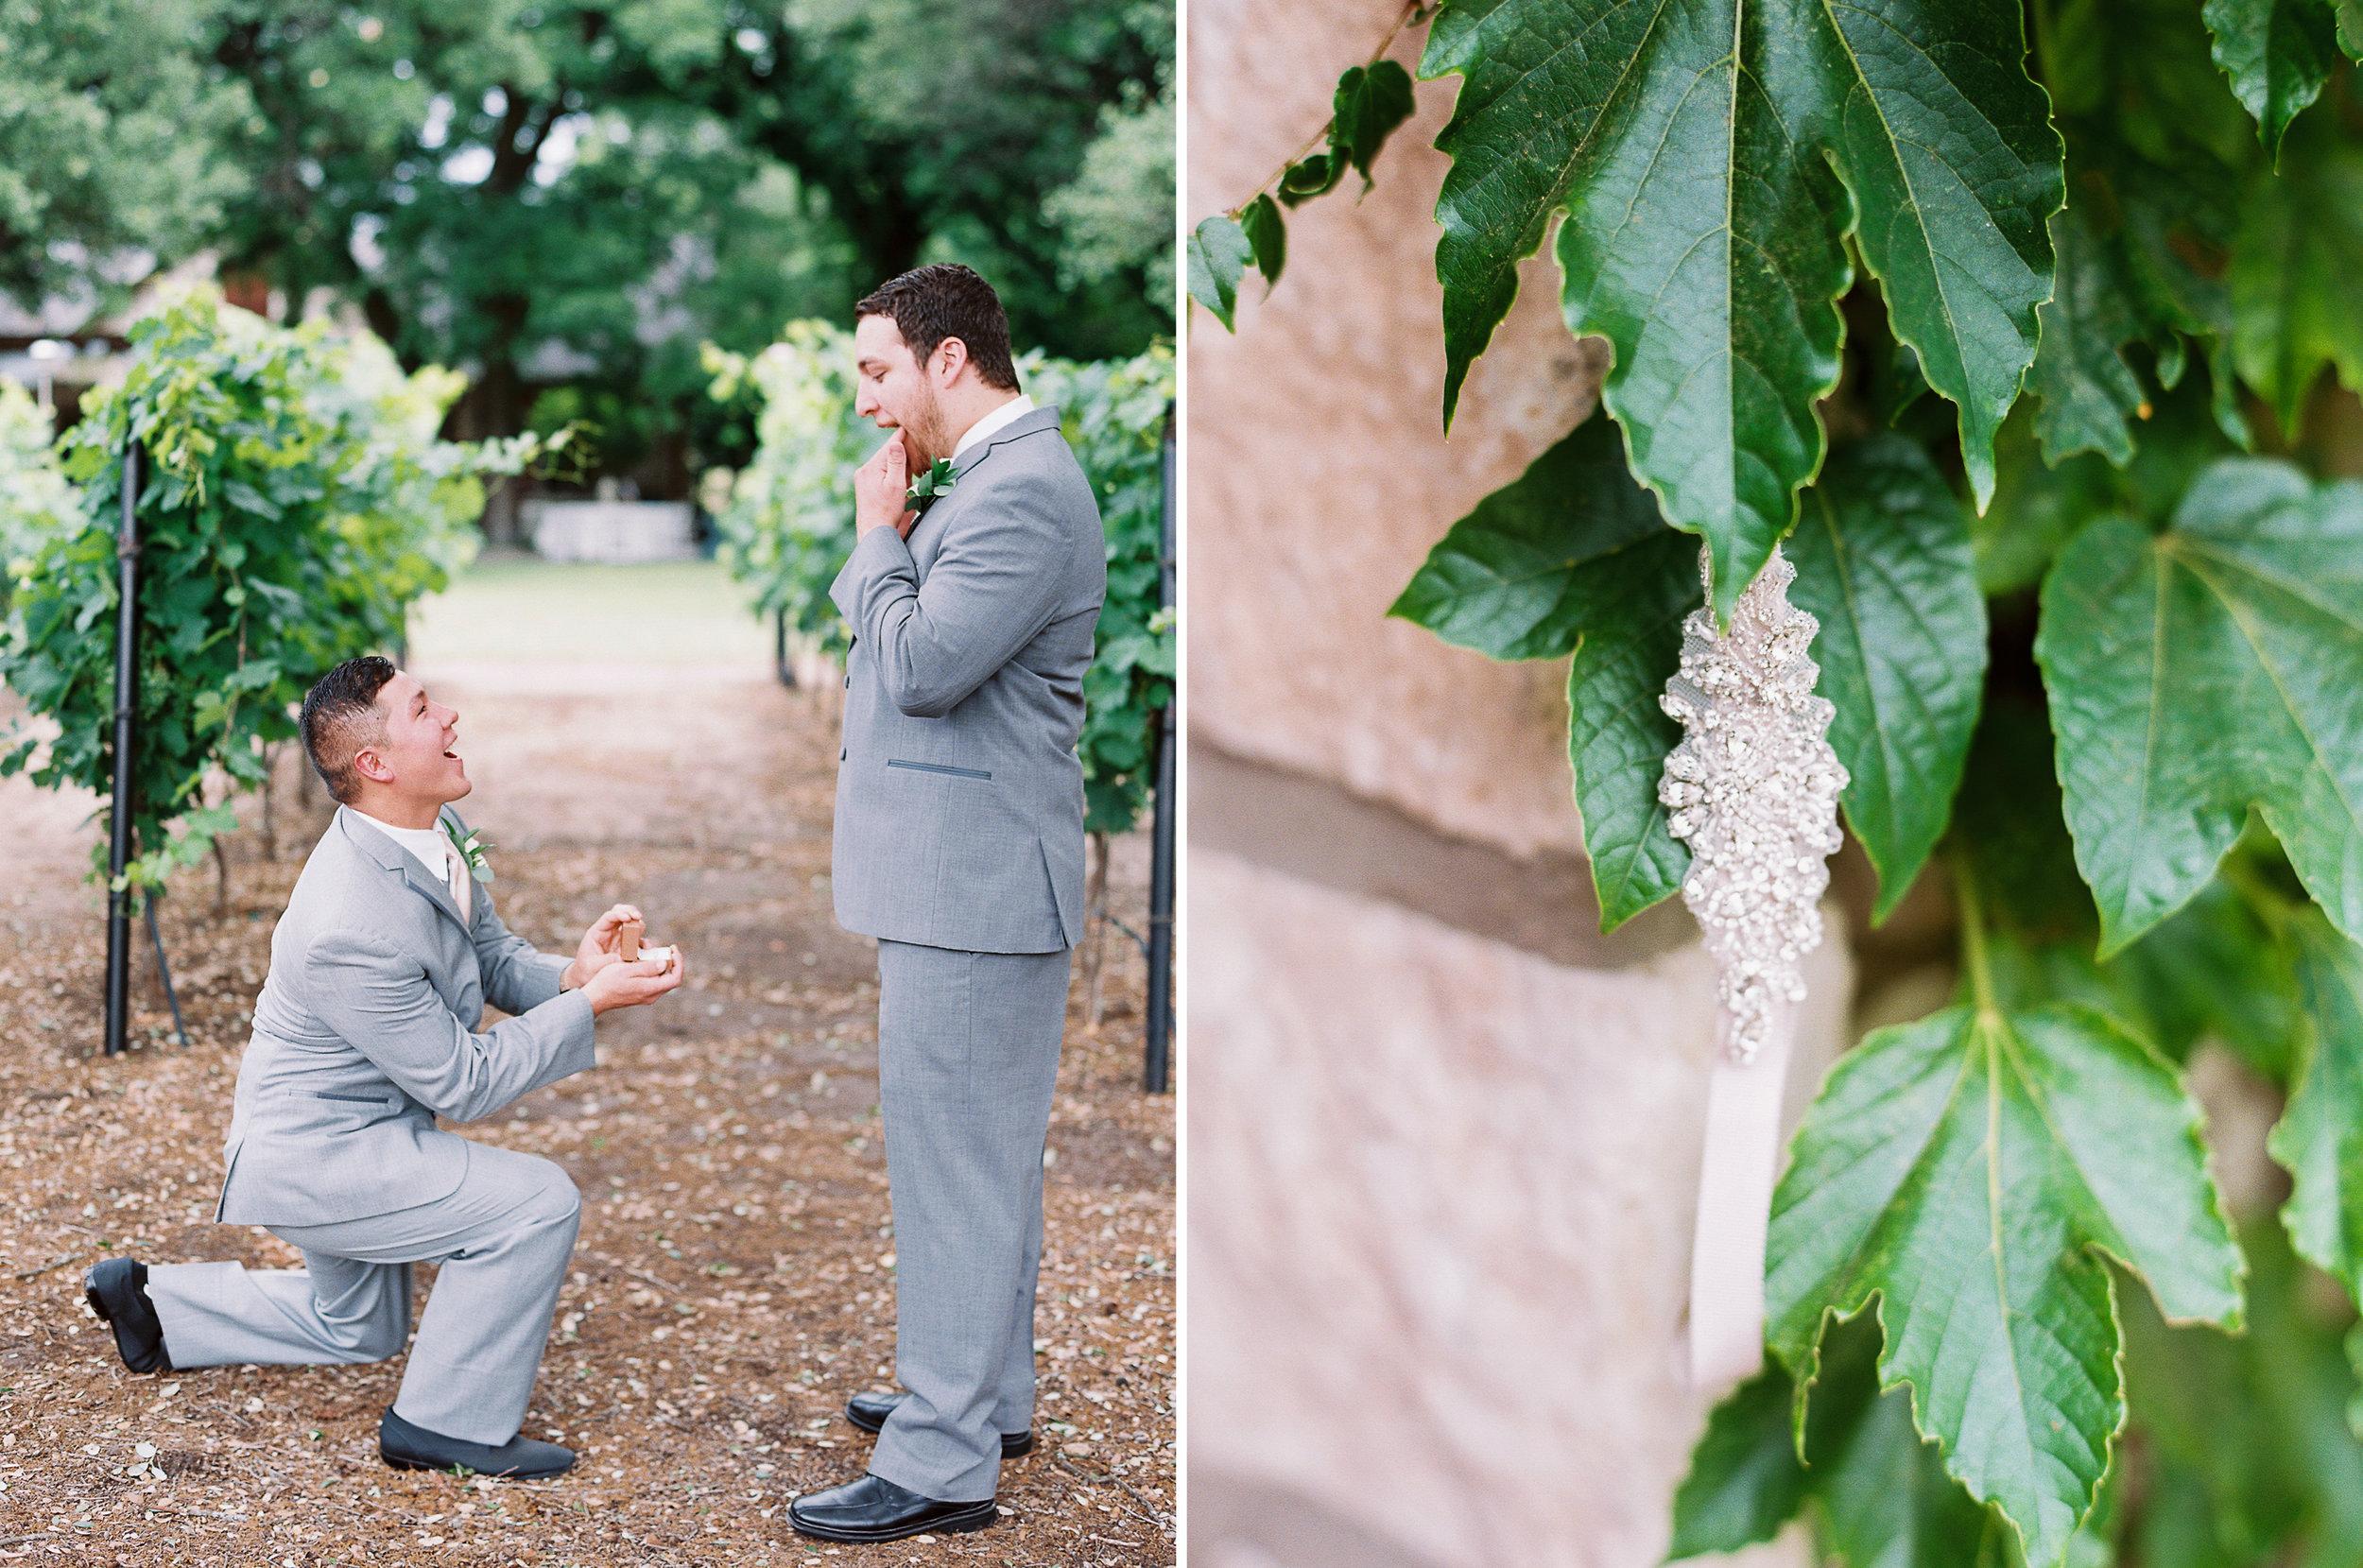 Elegant Spring Vineyard Wedding | Film Wedding Photographer | Austin Wedding Photographer | Fun Groomsmen Photos with Best Man | Britni Dean Photography // britnidean.com